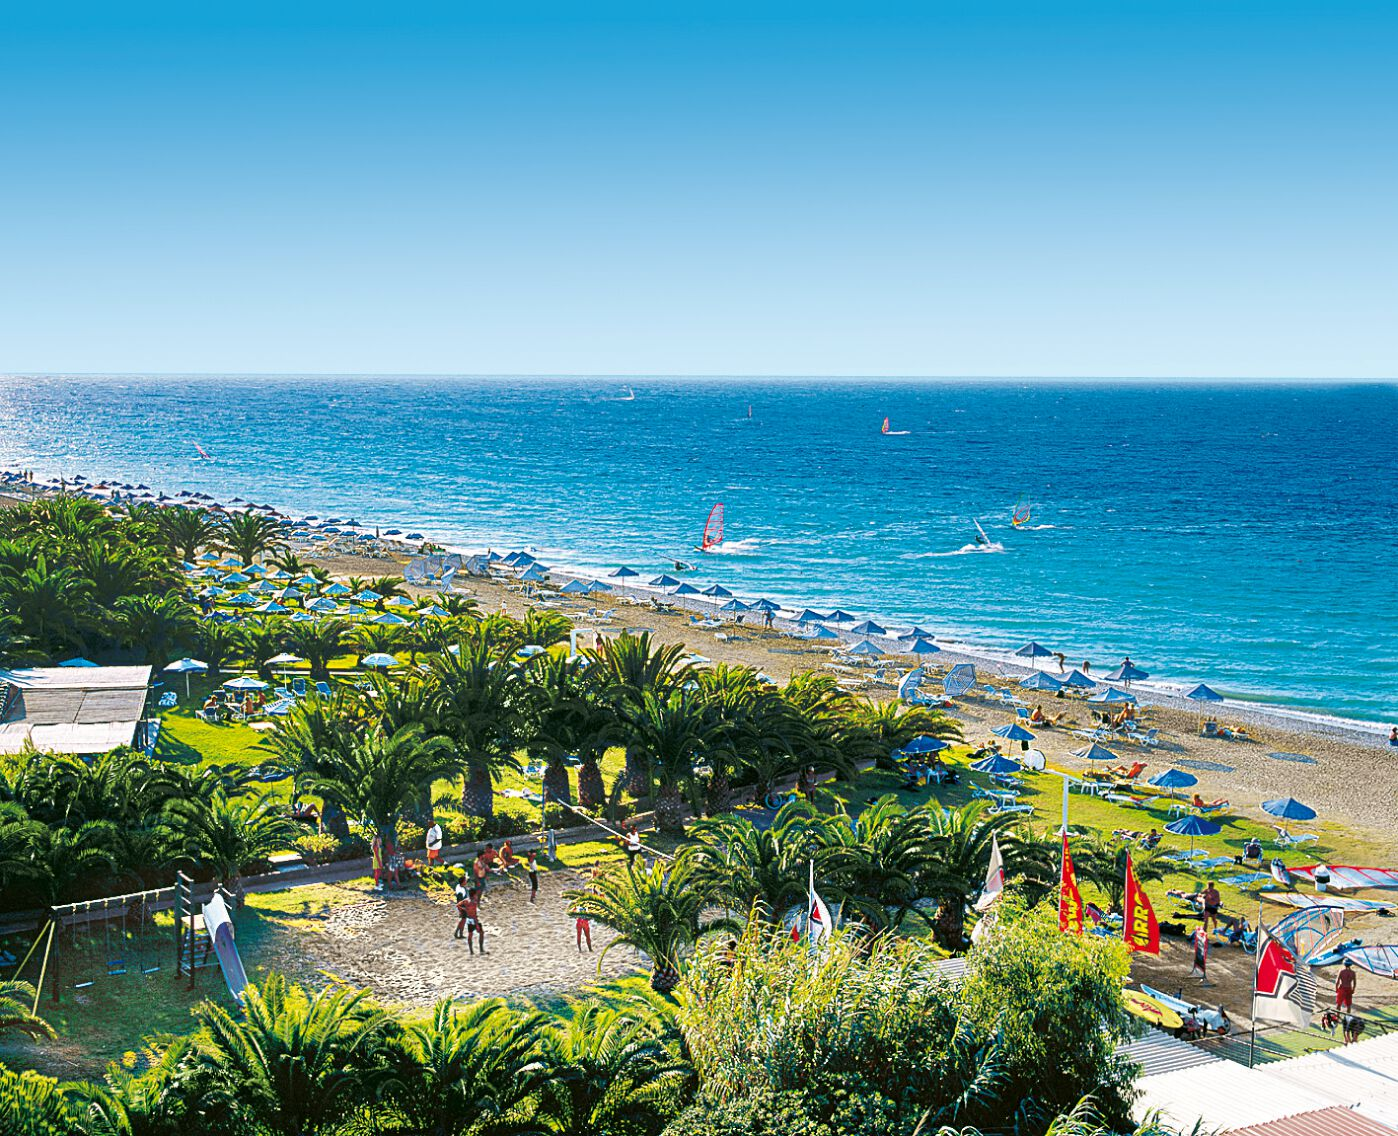 Séjour Iles du Dodécanèse - Hôtel Blue Horizon - 4*